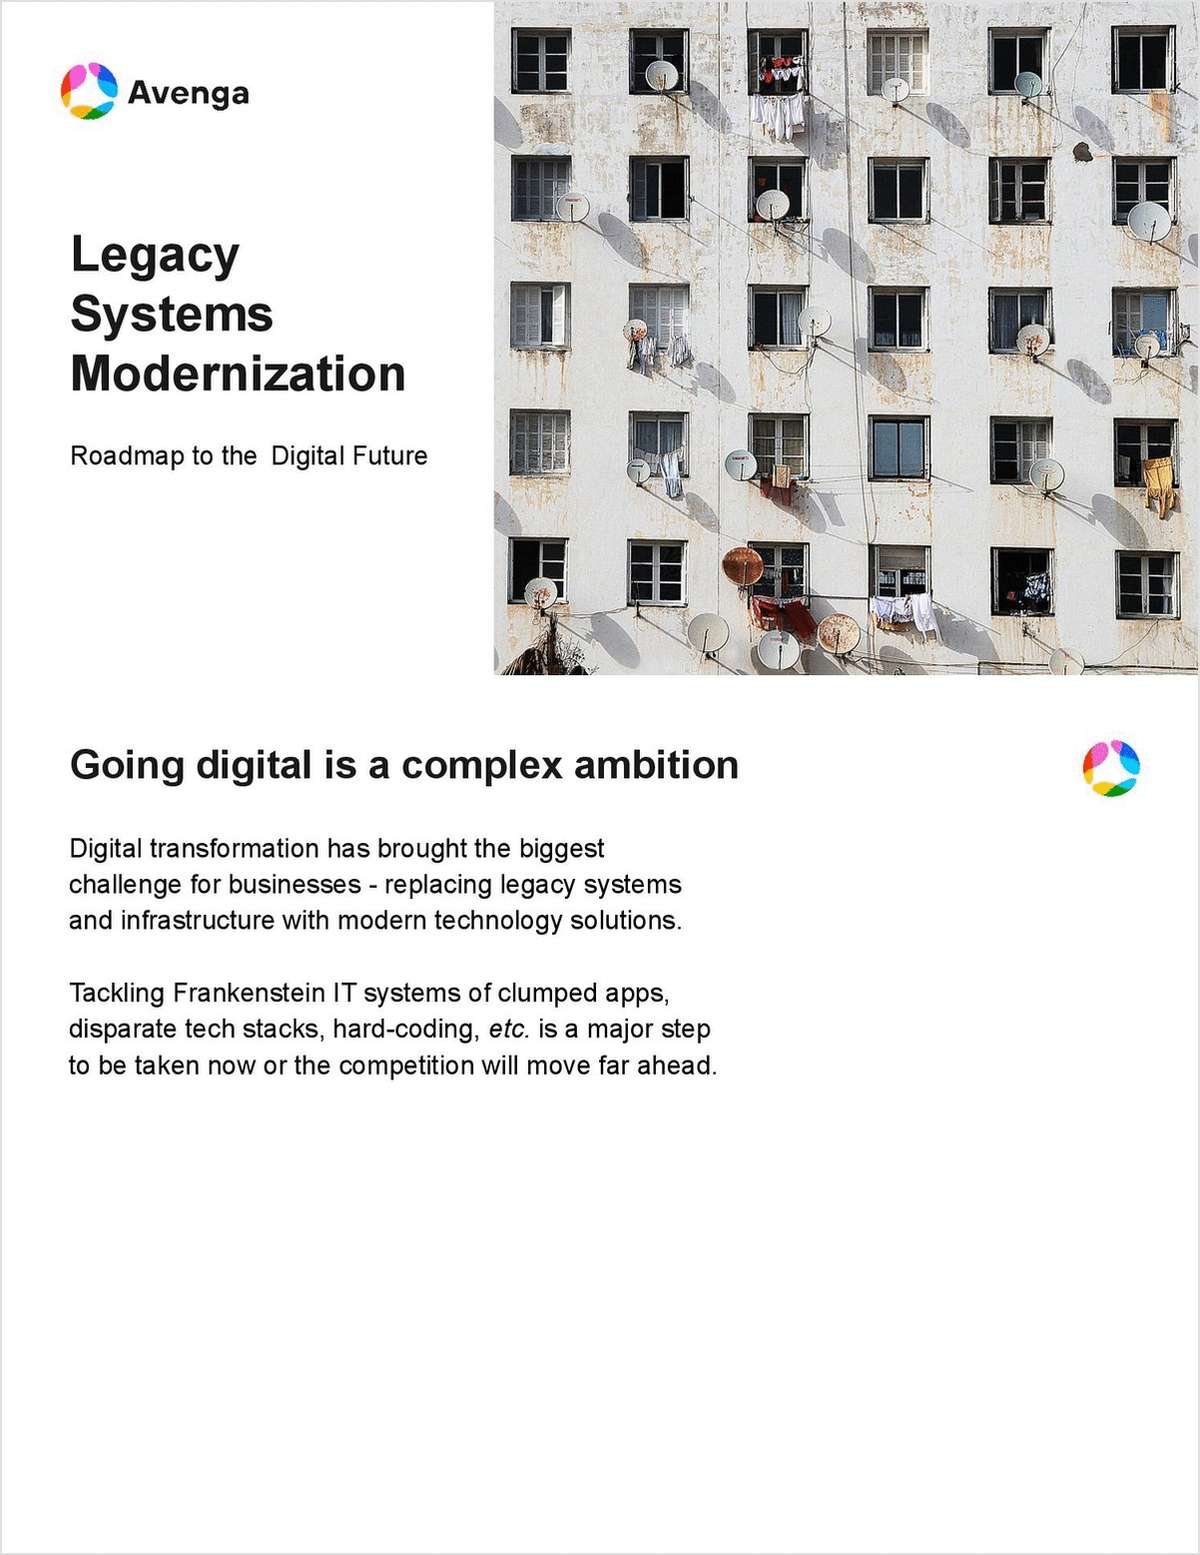 Legacy systems modernization: Roadmap to the Digital Future